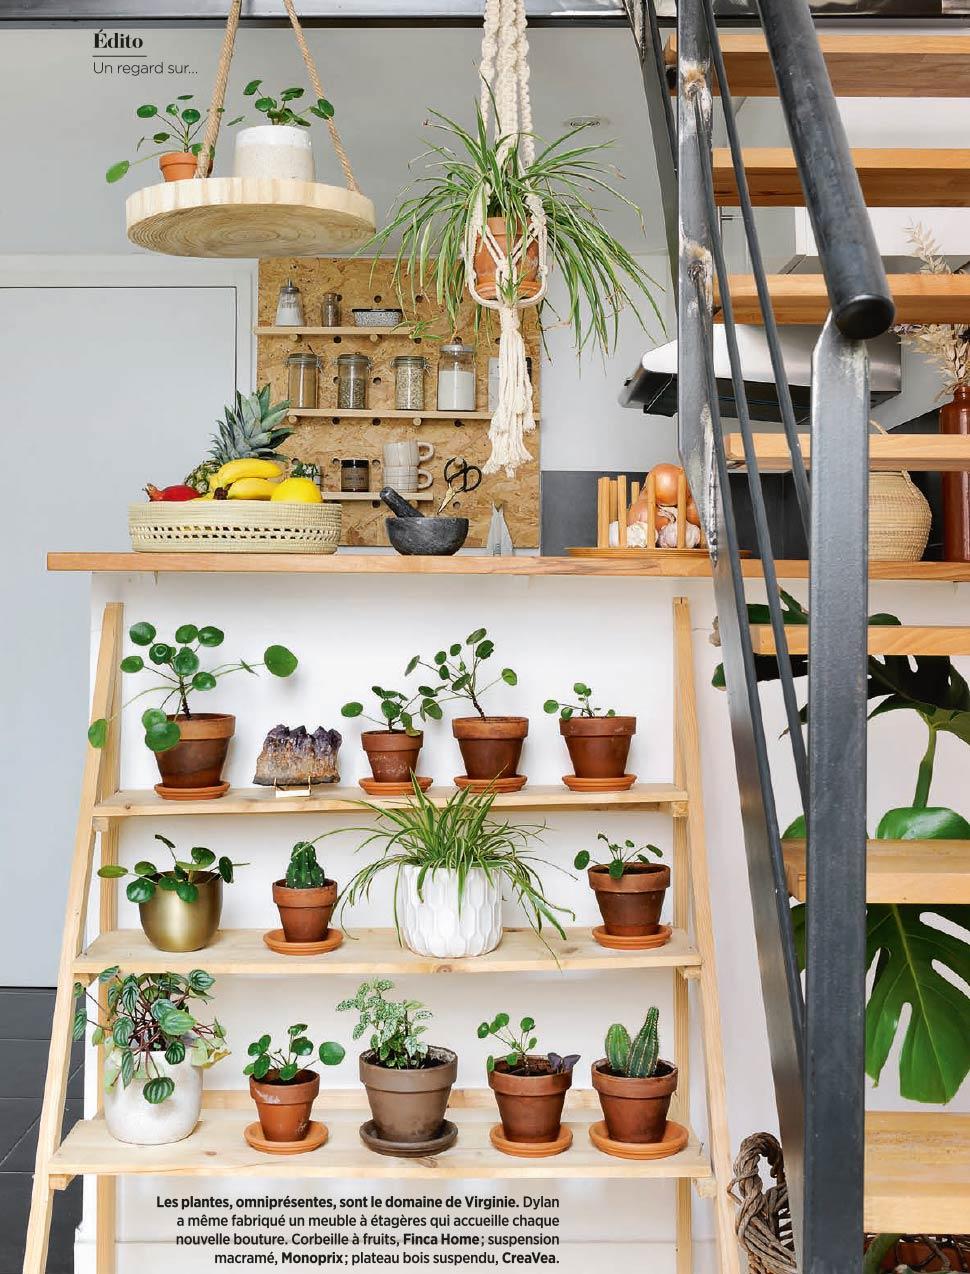 Reportage Finca Home - Maison Créative Septembre 2020